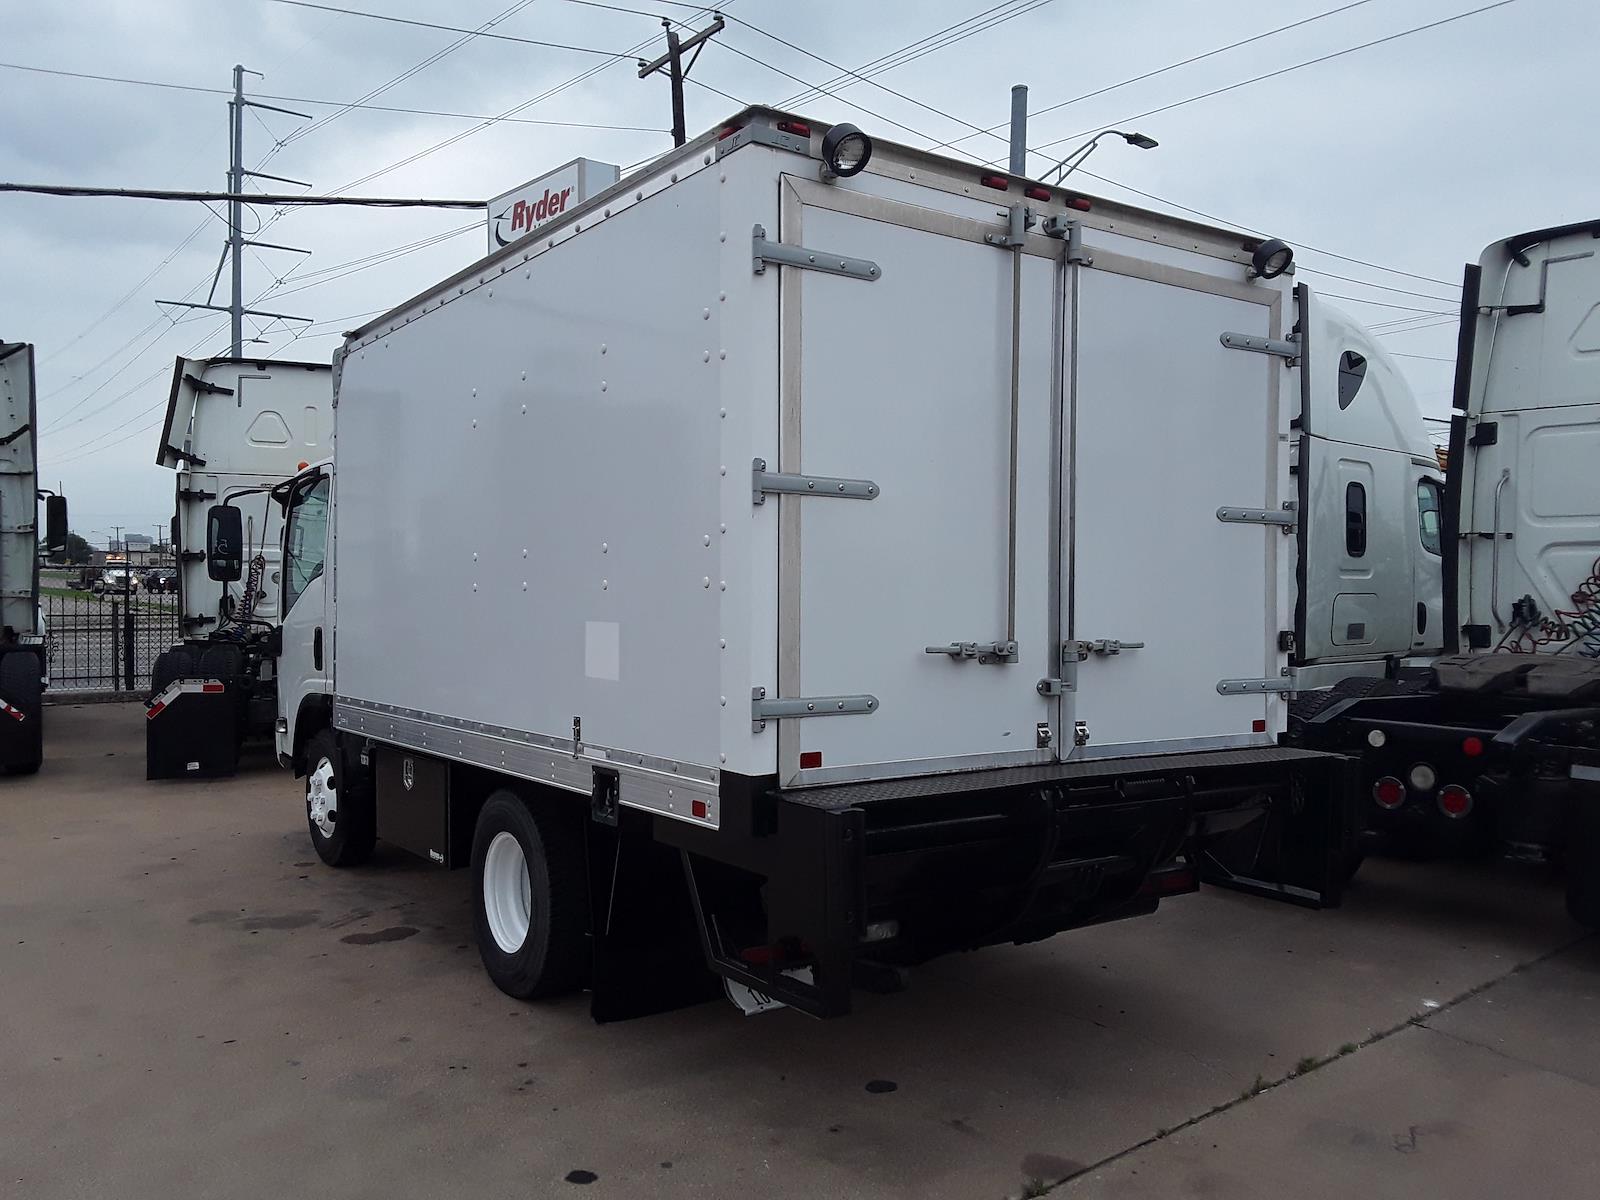 2014 Isuzu NPR Regular Cab 4x2, Dry Freight #551340 - photo 1